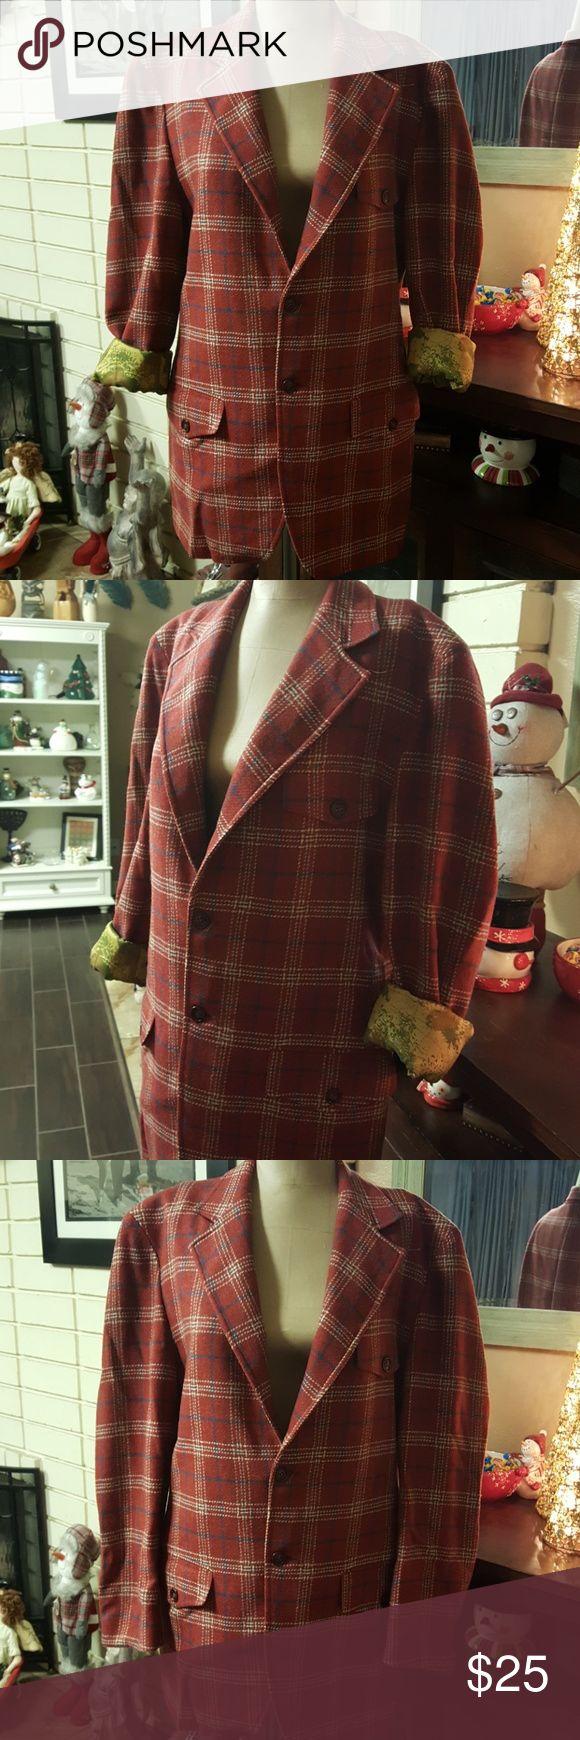 "Vintage Plaid Wool Blazer Men's Yorktowne Vintage Plaid Wool Blazer Men's Yorktowne Vintage Worn Chest 39"" inches. Vintage Suits & Blazers Sport Coats & Blazers"